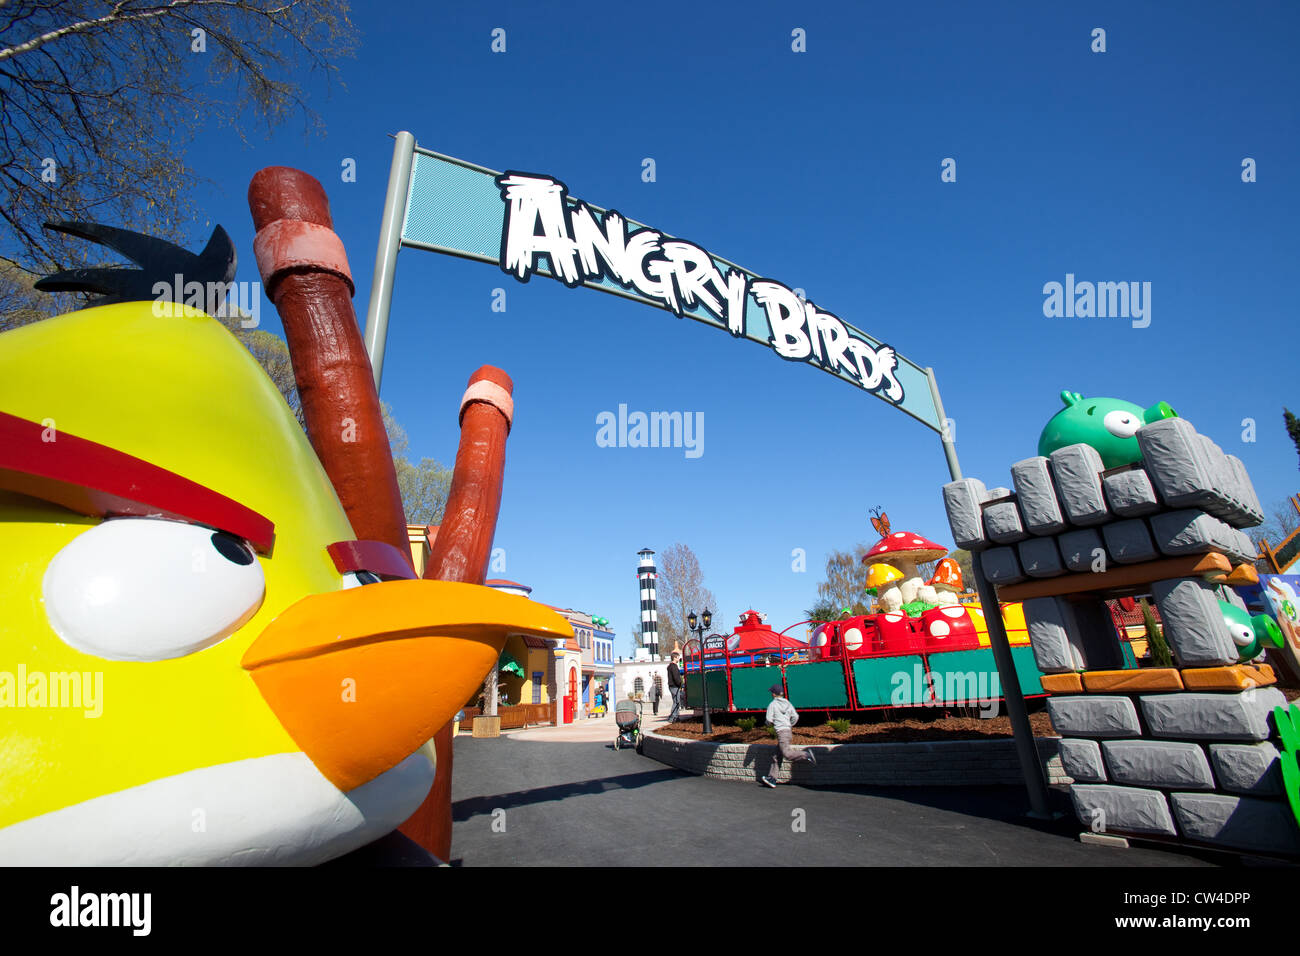 Angry Birds Land, Särkänniemi, Tampere, Finland - Stock Image